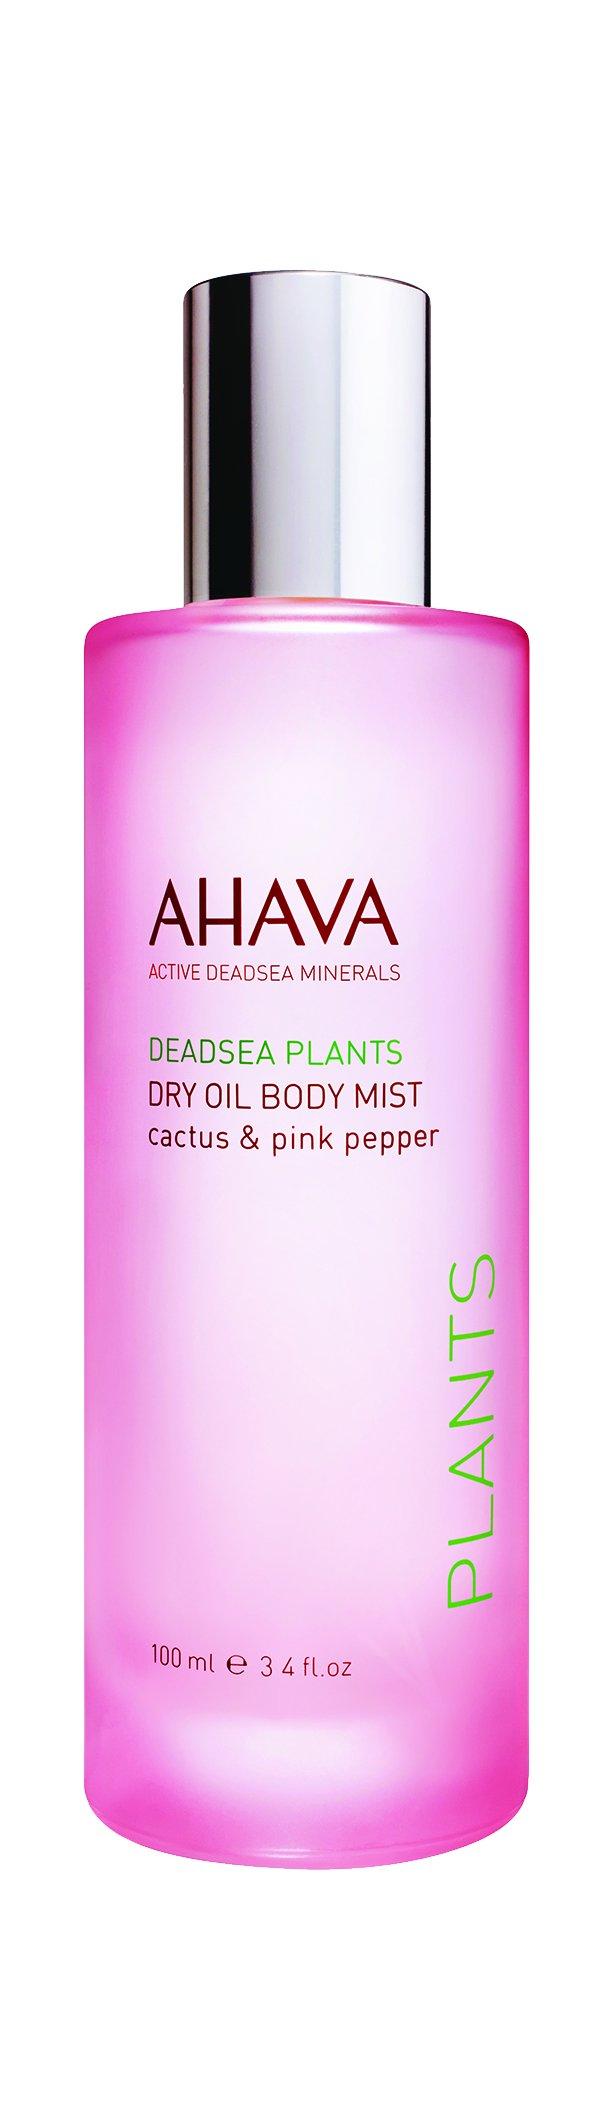 AHAVA Dry Oil Body Mist Cactus And Pink Pepper, 3.4 fl. oz.